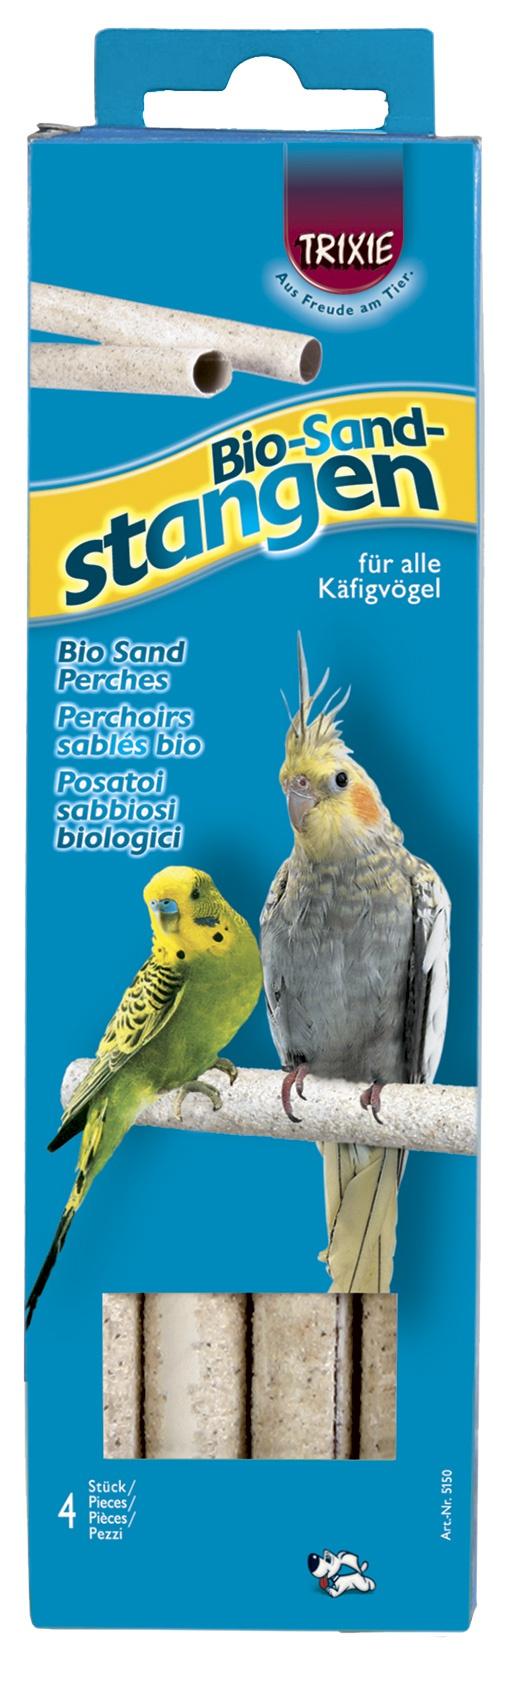 Аксессуар для птичьей клетки - Bio Sand Perches, 19,5cm, 4 шт